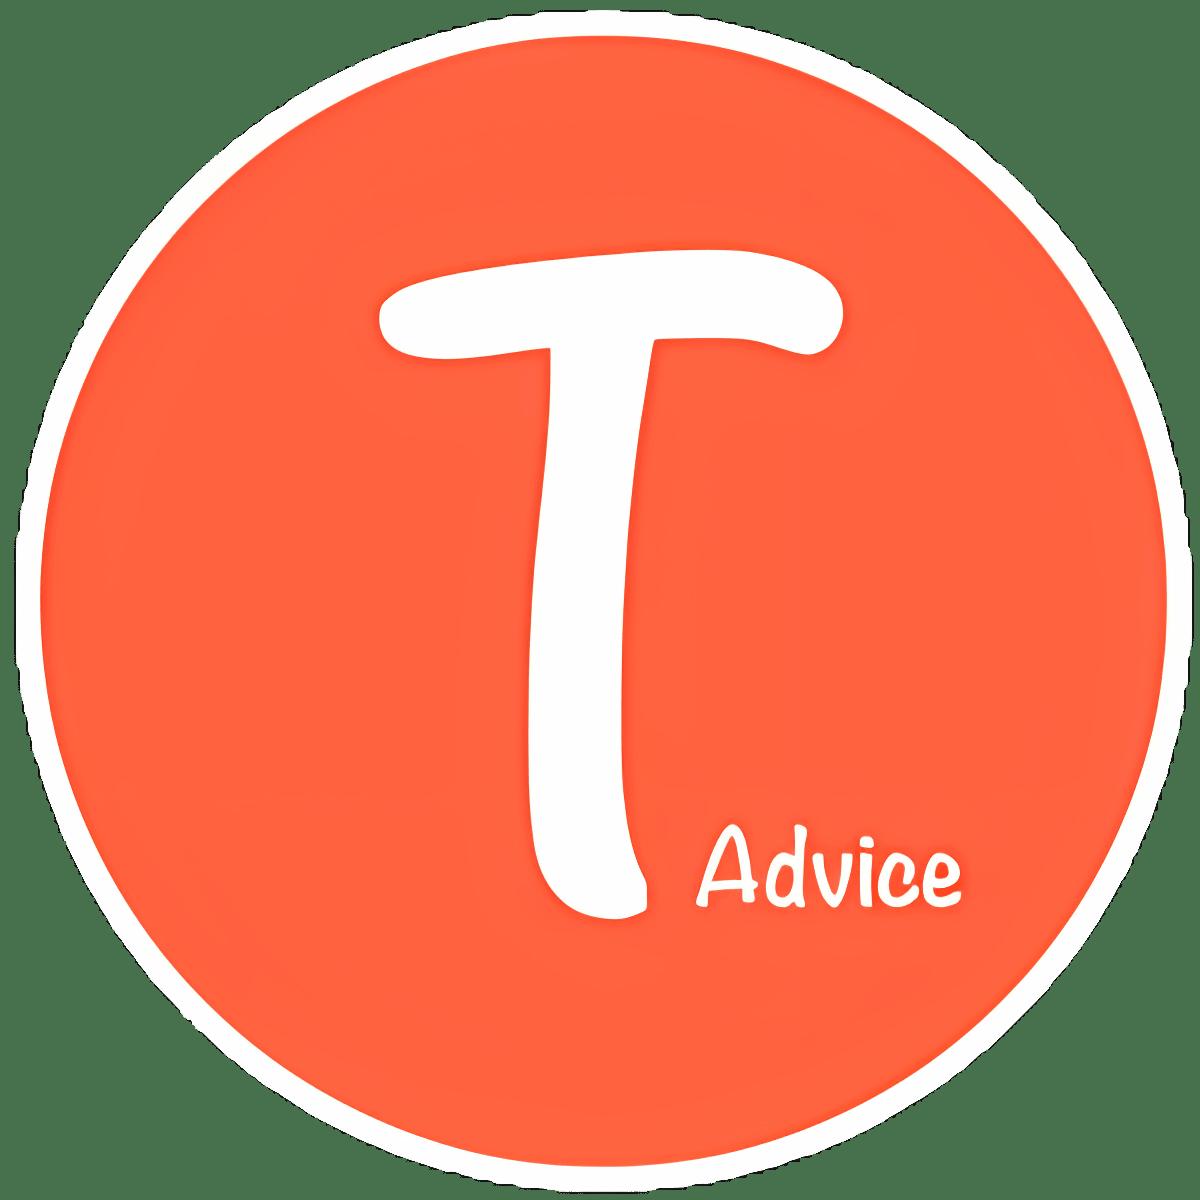 Free Tango Video Chat Advice